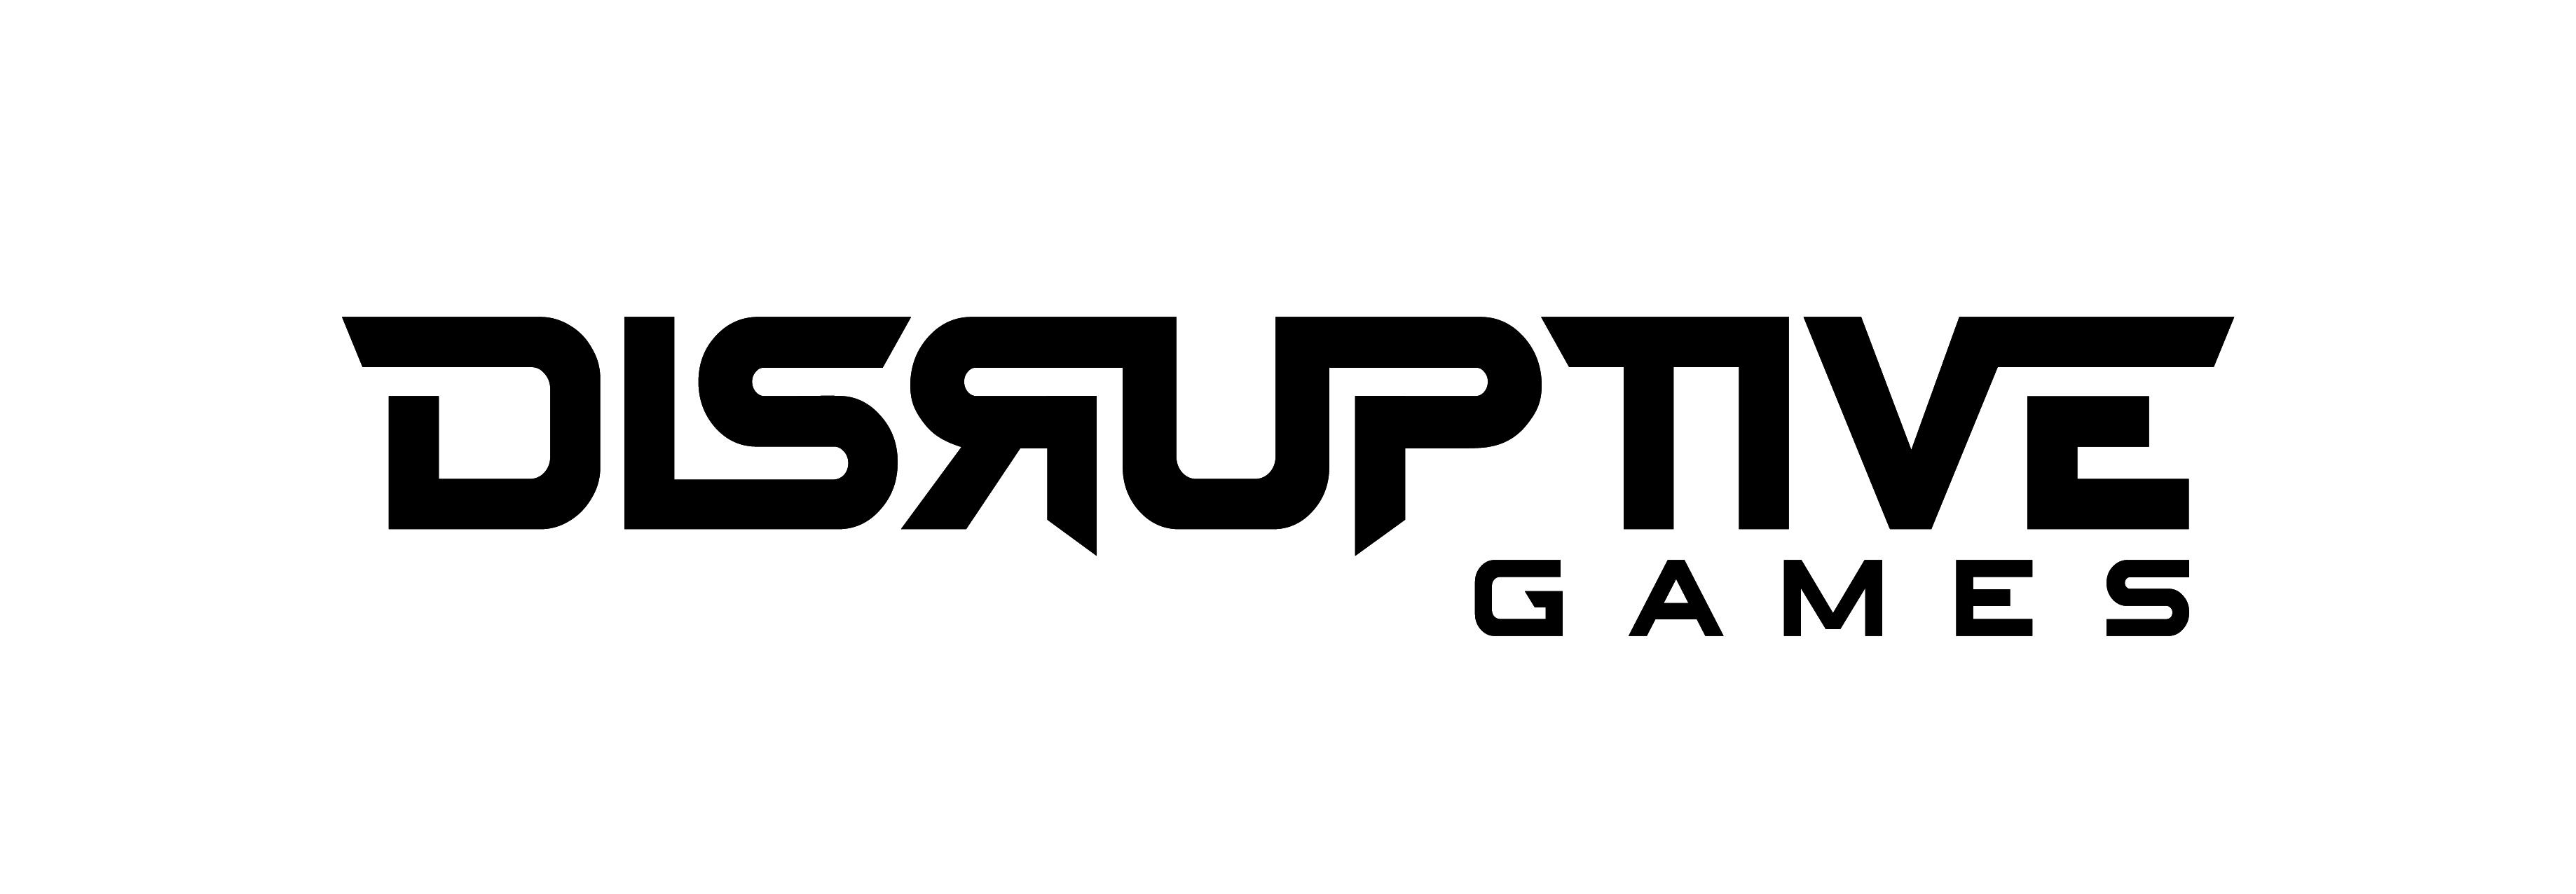 Disruptive Games